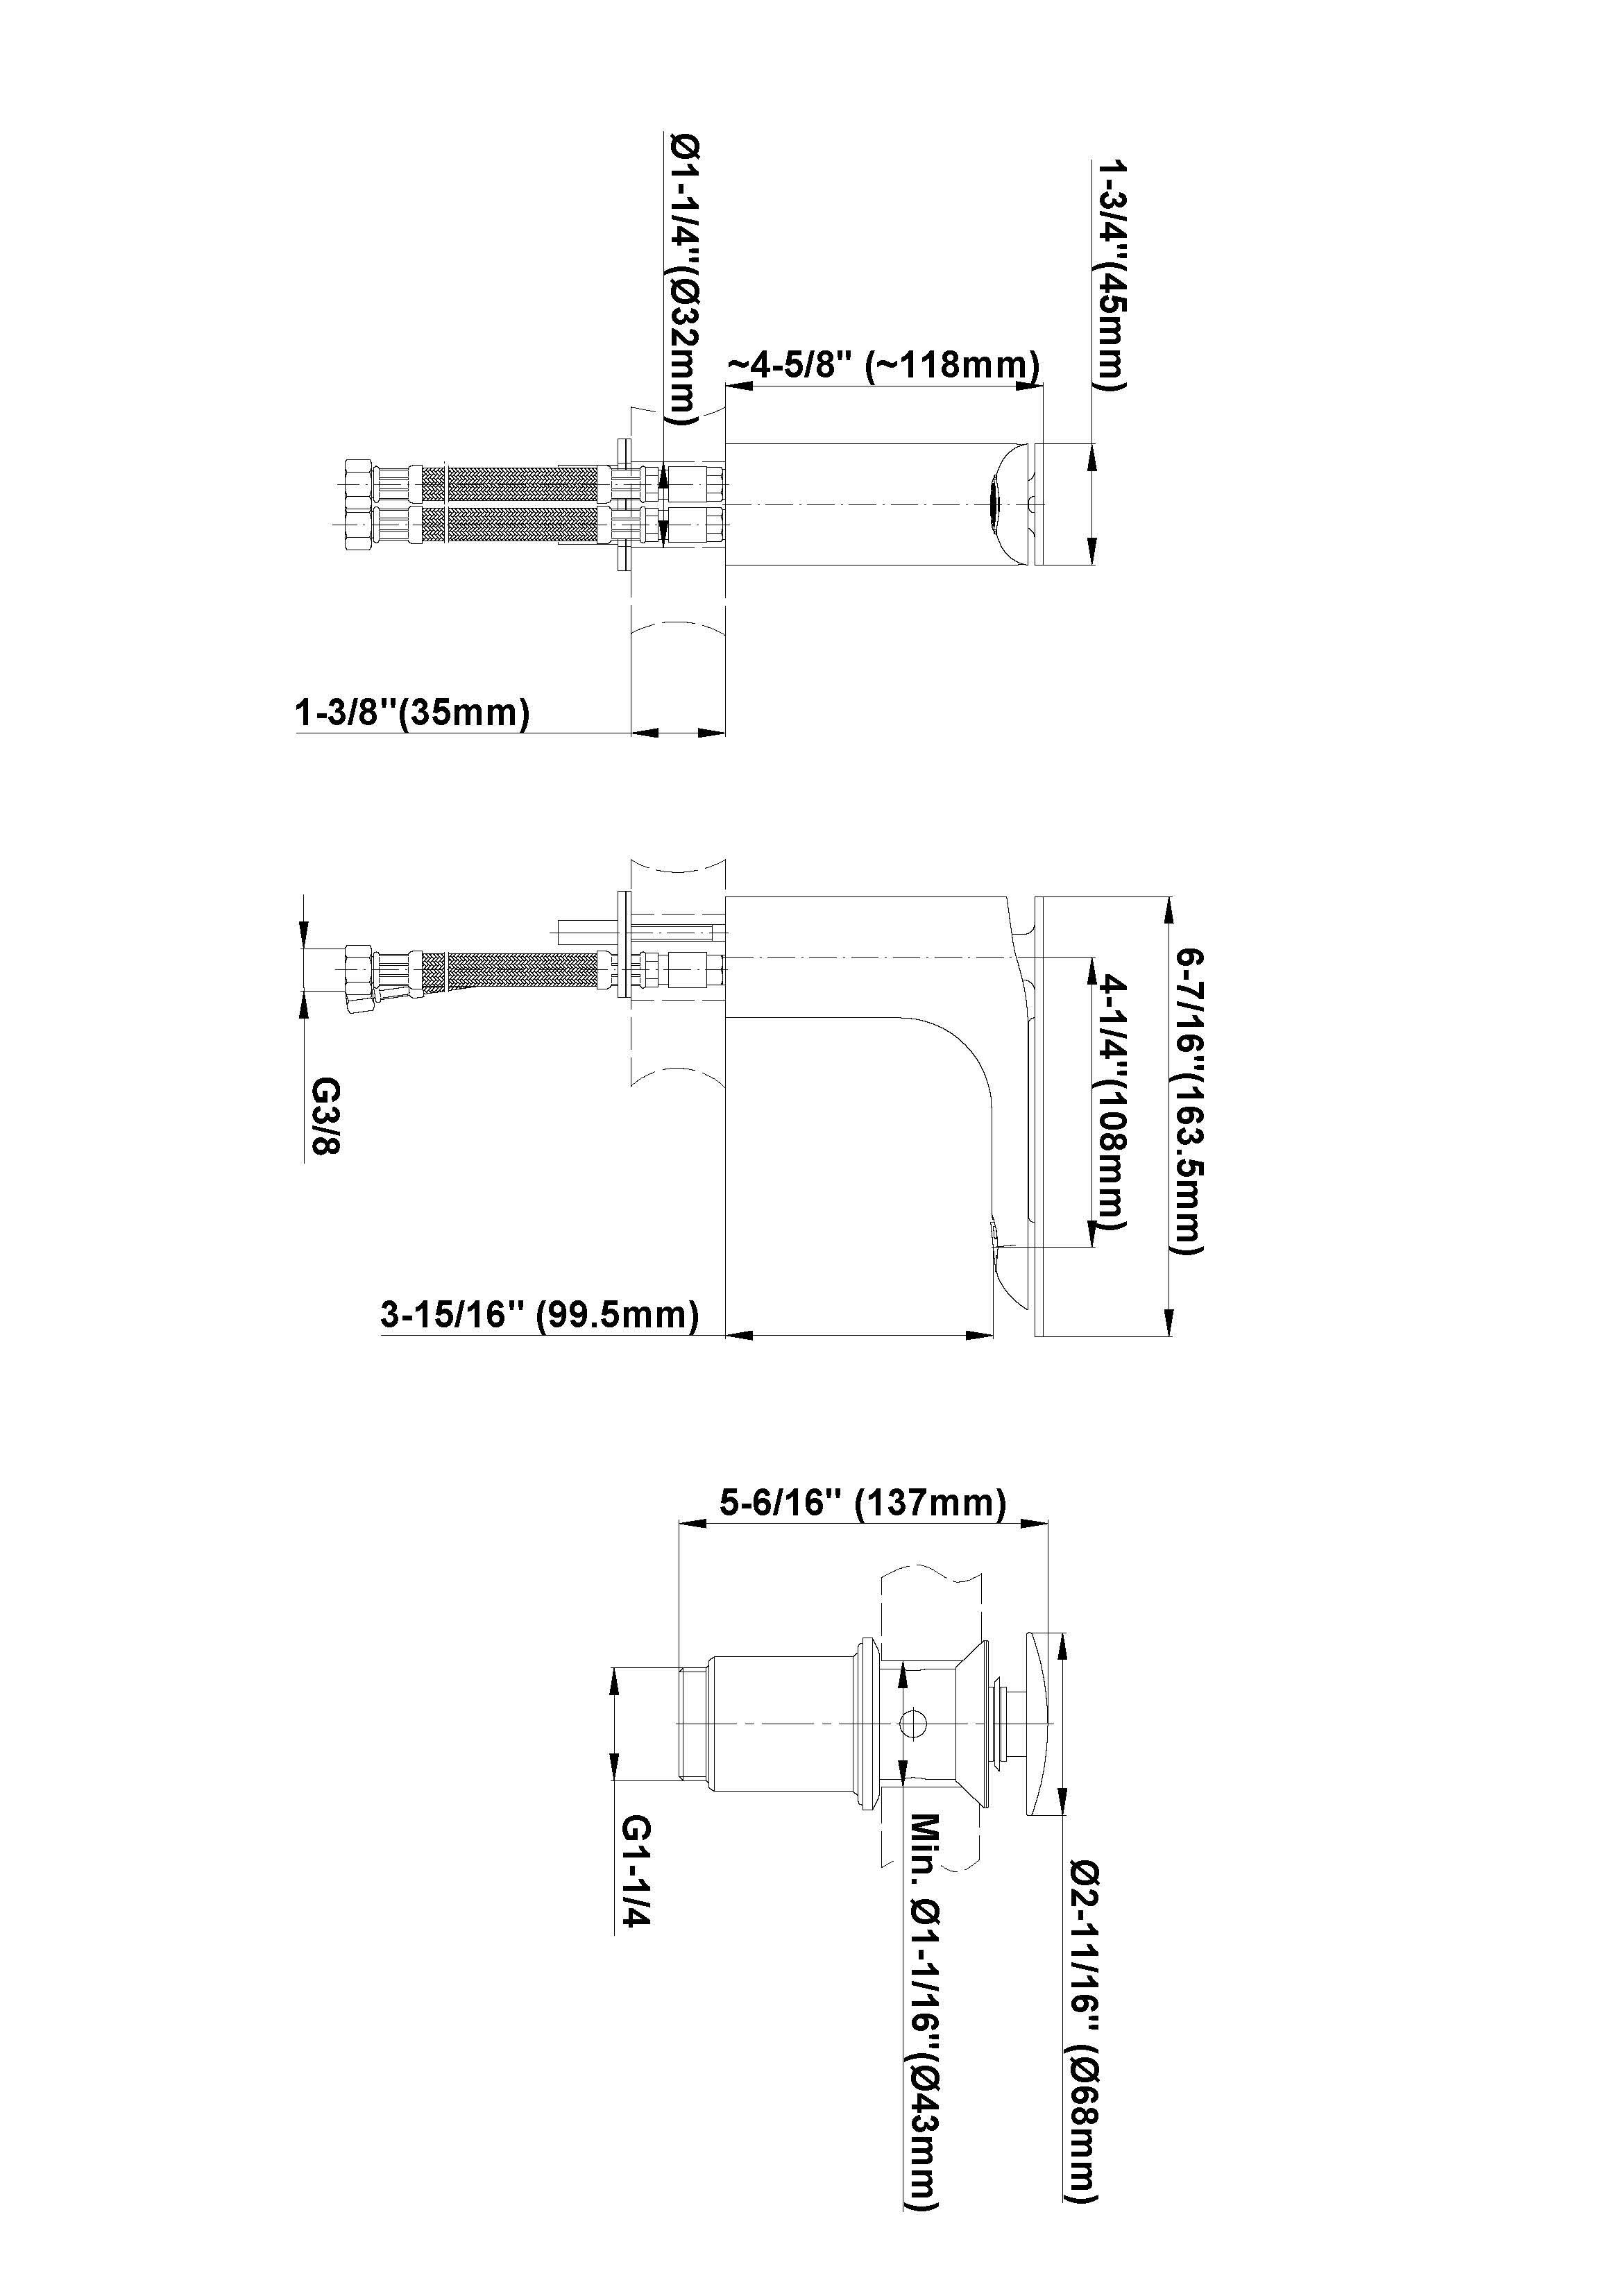 Baterie de lavoar 10,8cm Graff Sento 239800 Fisa tehnica